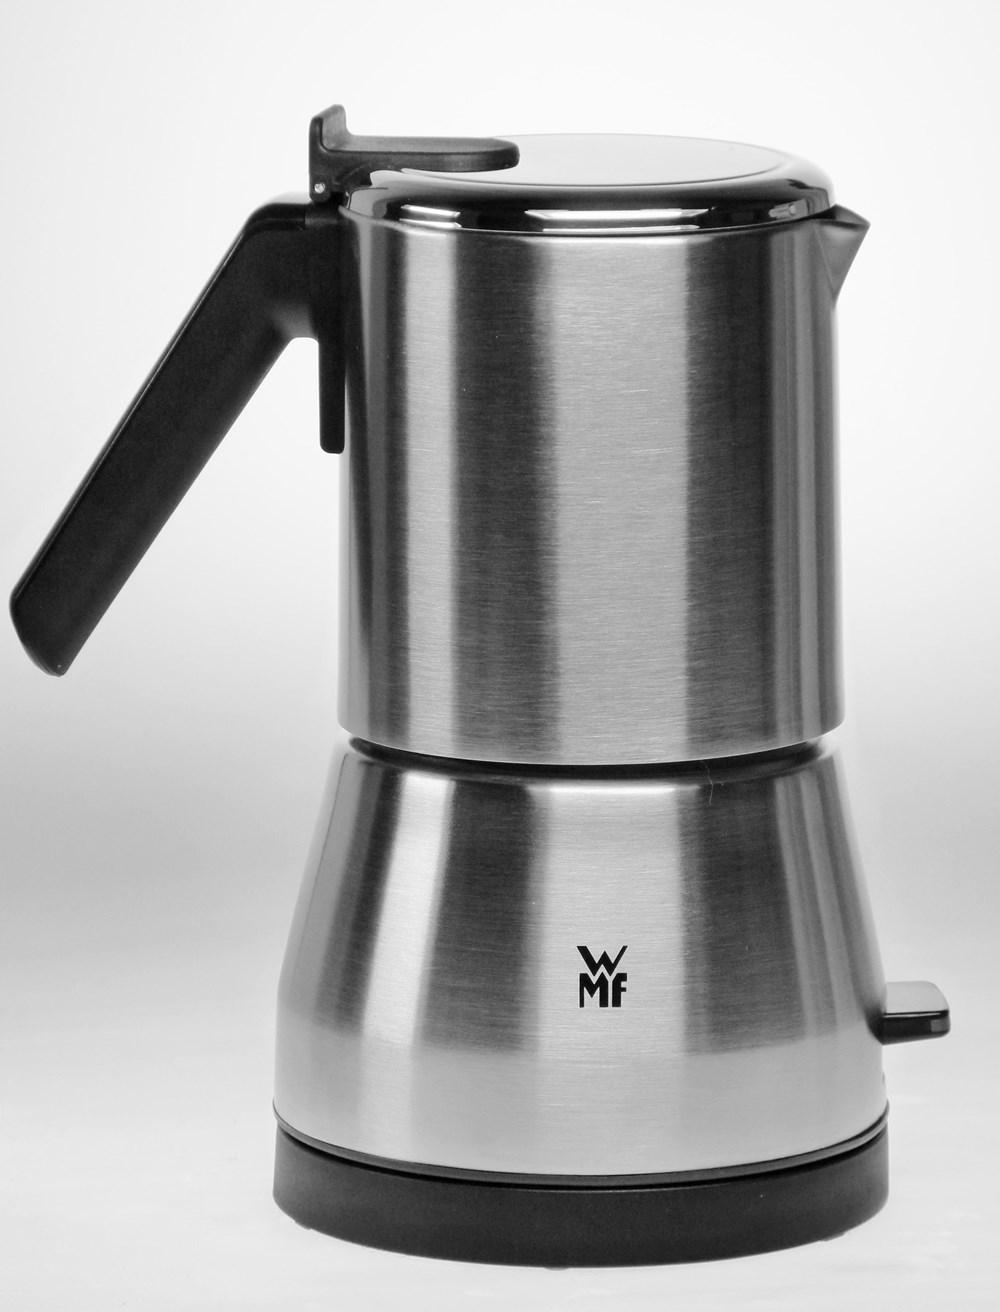 ab euro rommelsbacher eko 366e espressokocher edelstahl kaffeemaschinen und. Black Bedroom Furniture Sets. Home Design Ideas